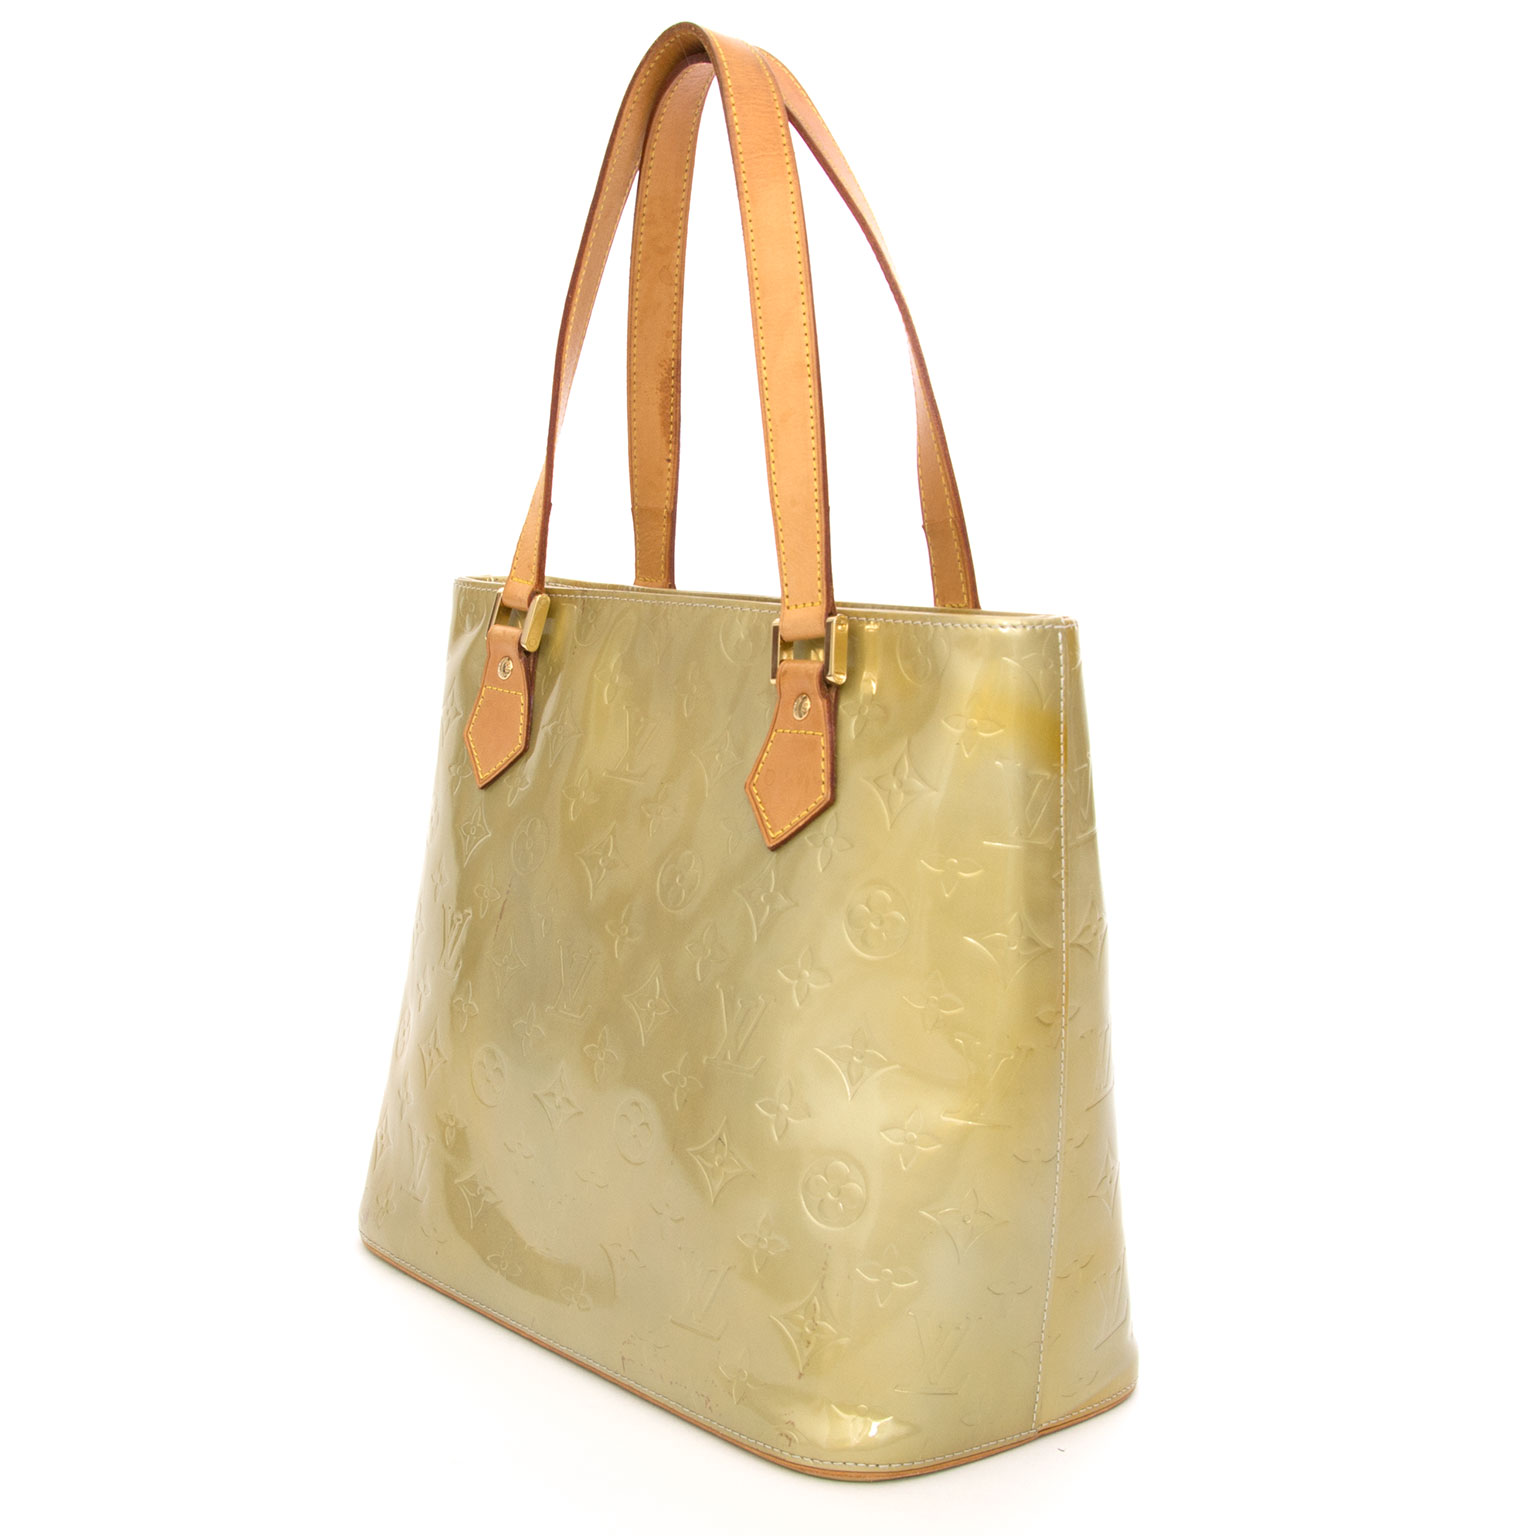 b86dd618e45 ... acheter en ligne seconde main sac a main Delvaux Camille Pm Hobo  Shoulder Brown Nubuck Brown · Louis Vuitton